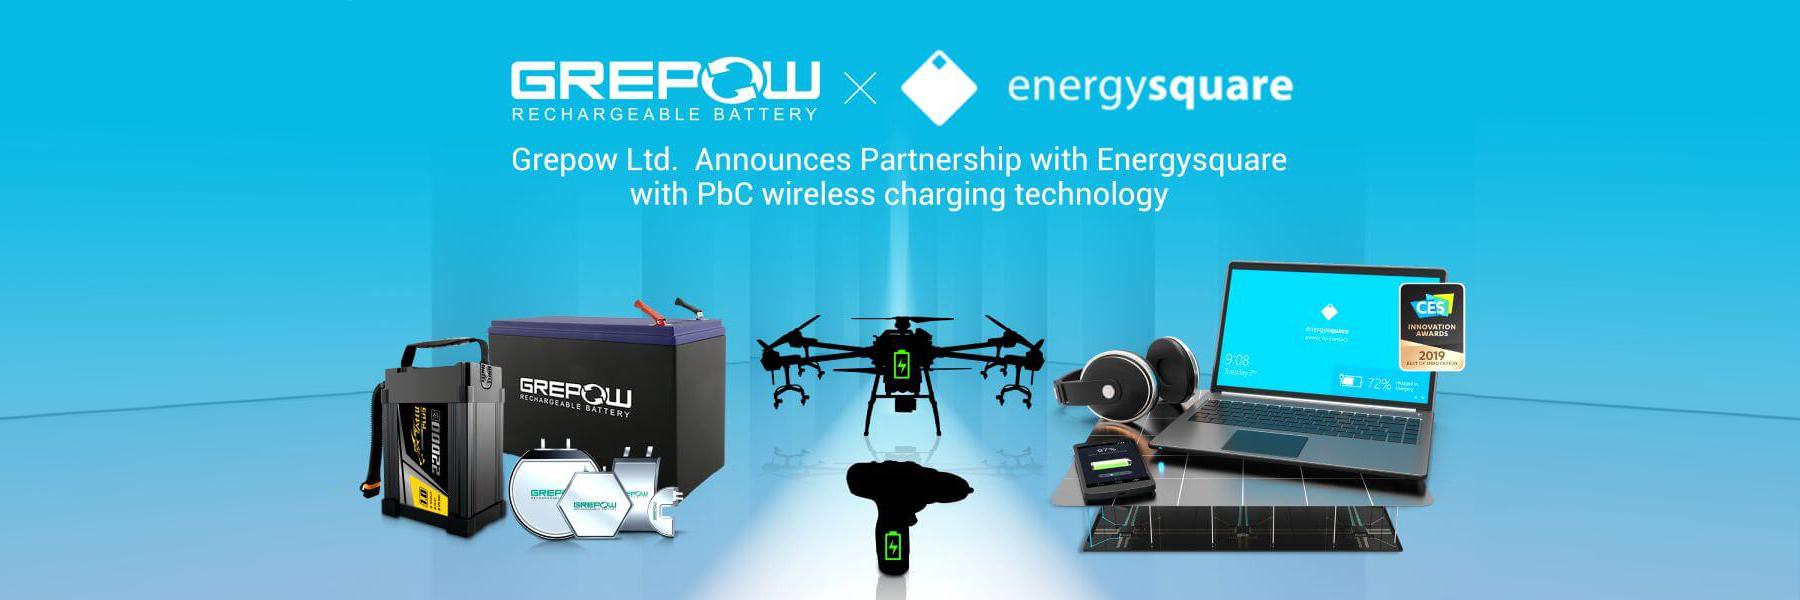 Grepow Ltd.  Announces Partnership with energysquare with PbC® wireless charging technology